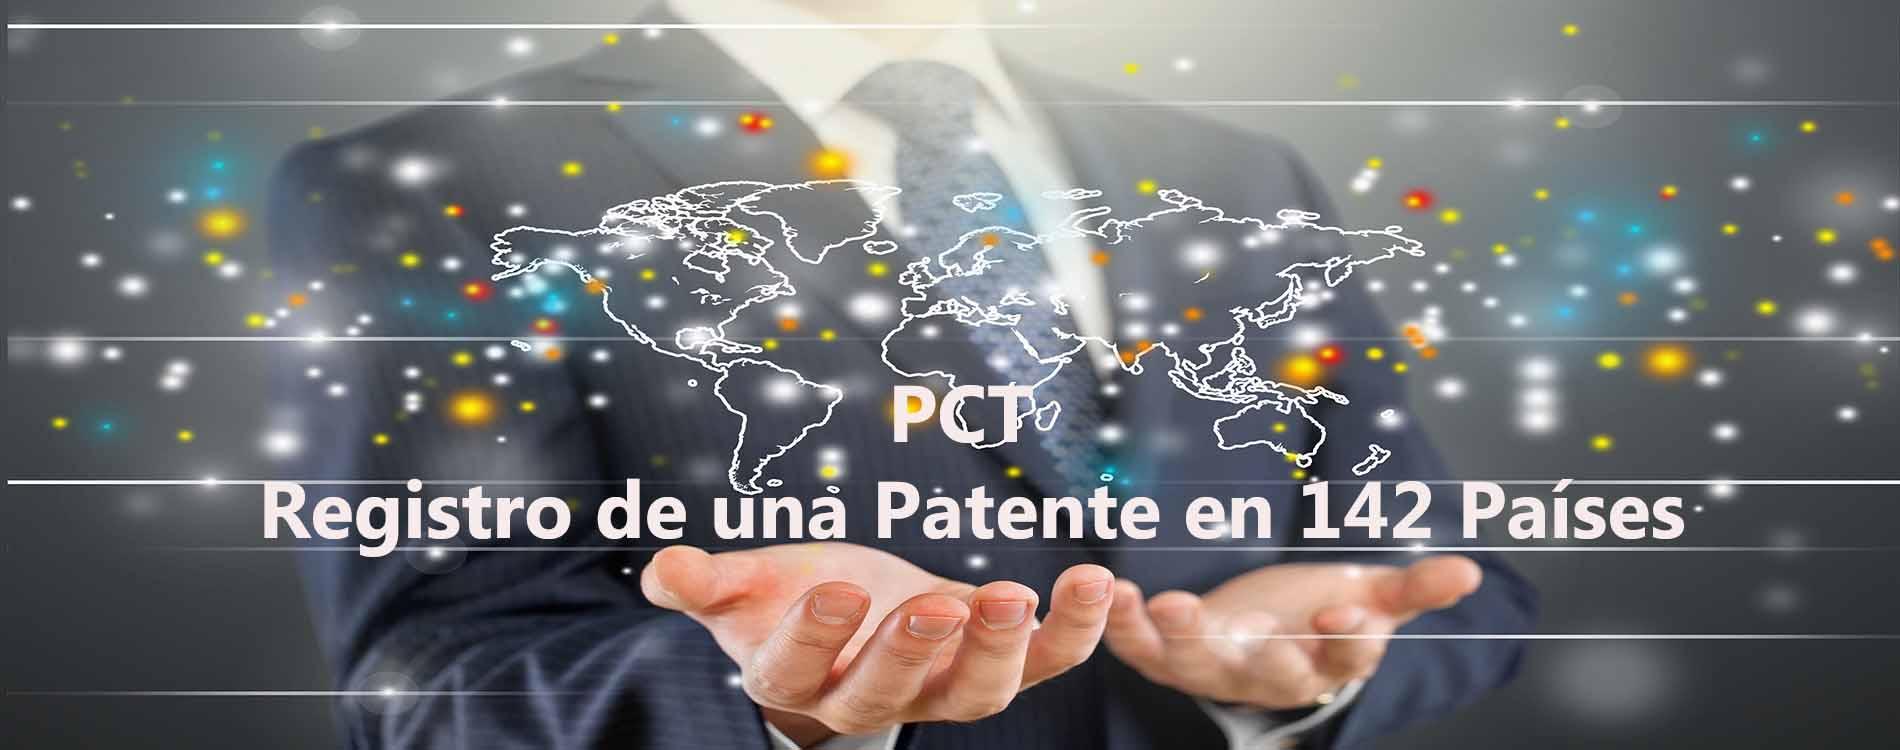 patente_pct2